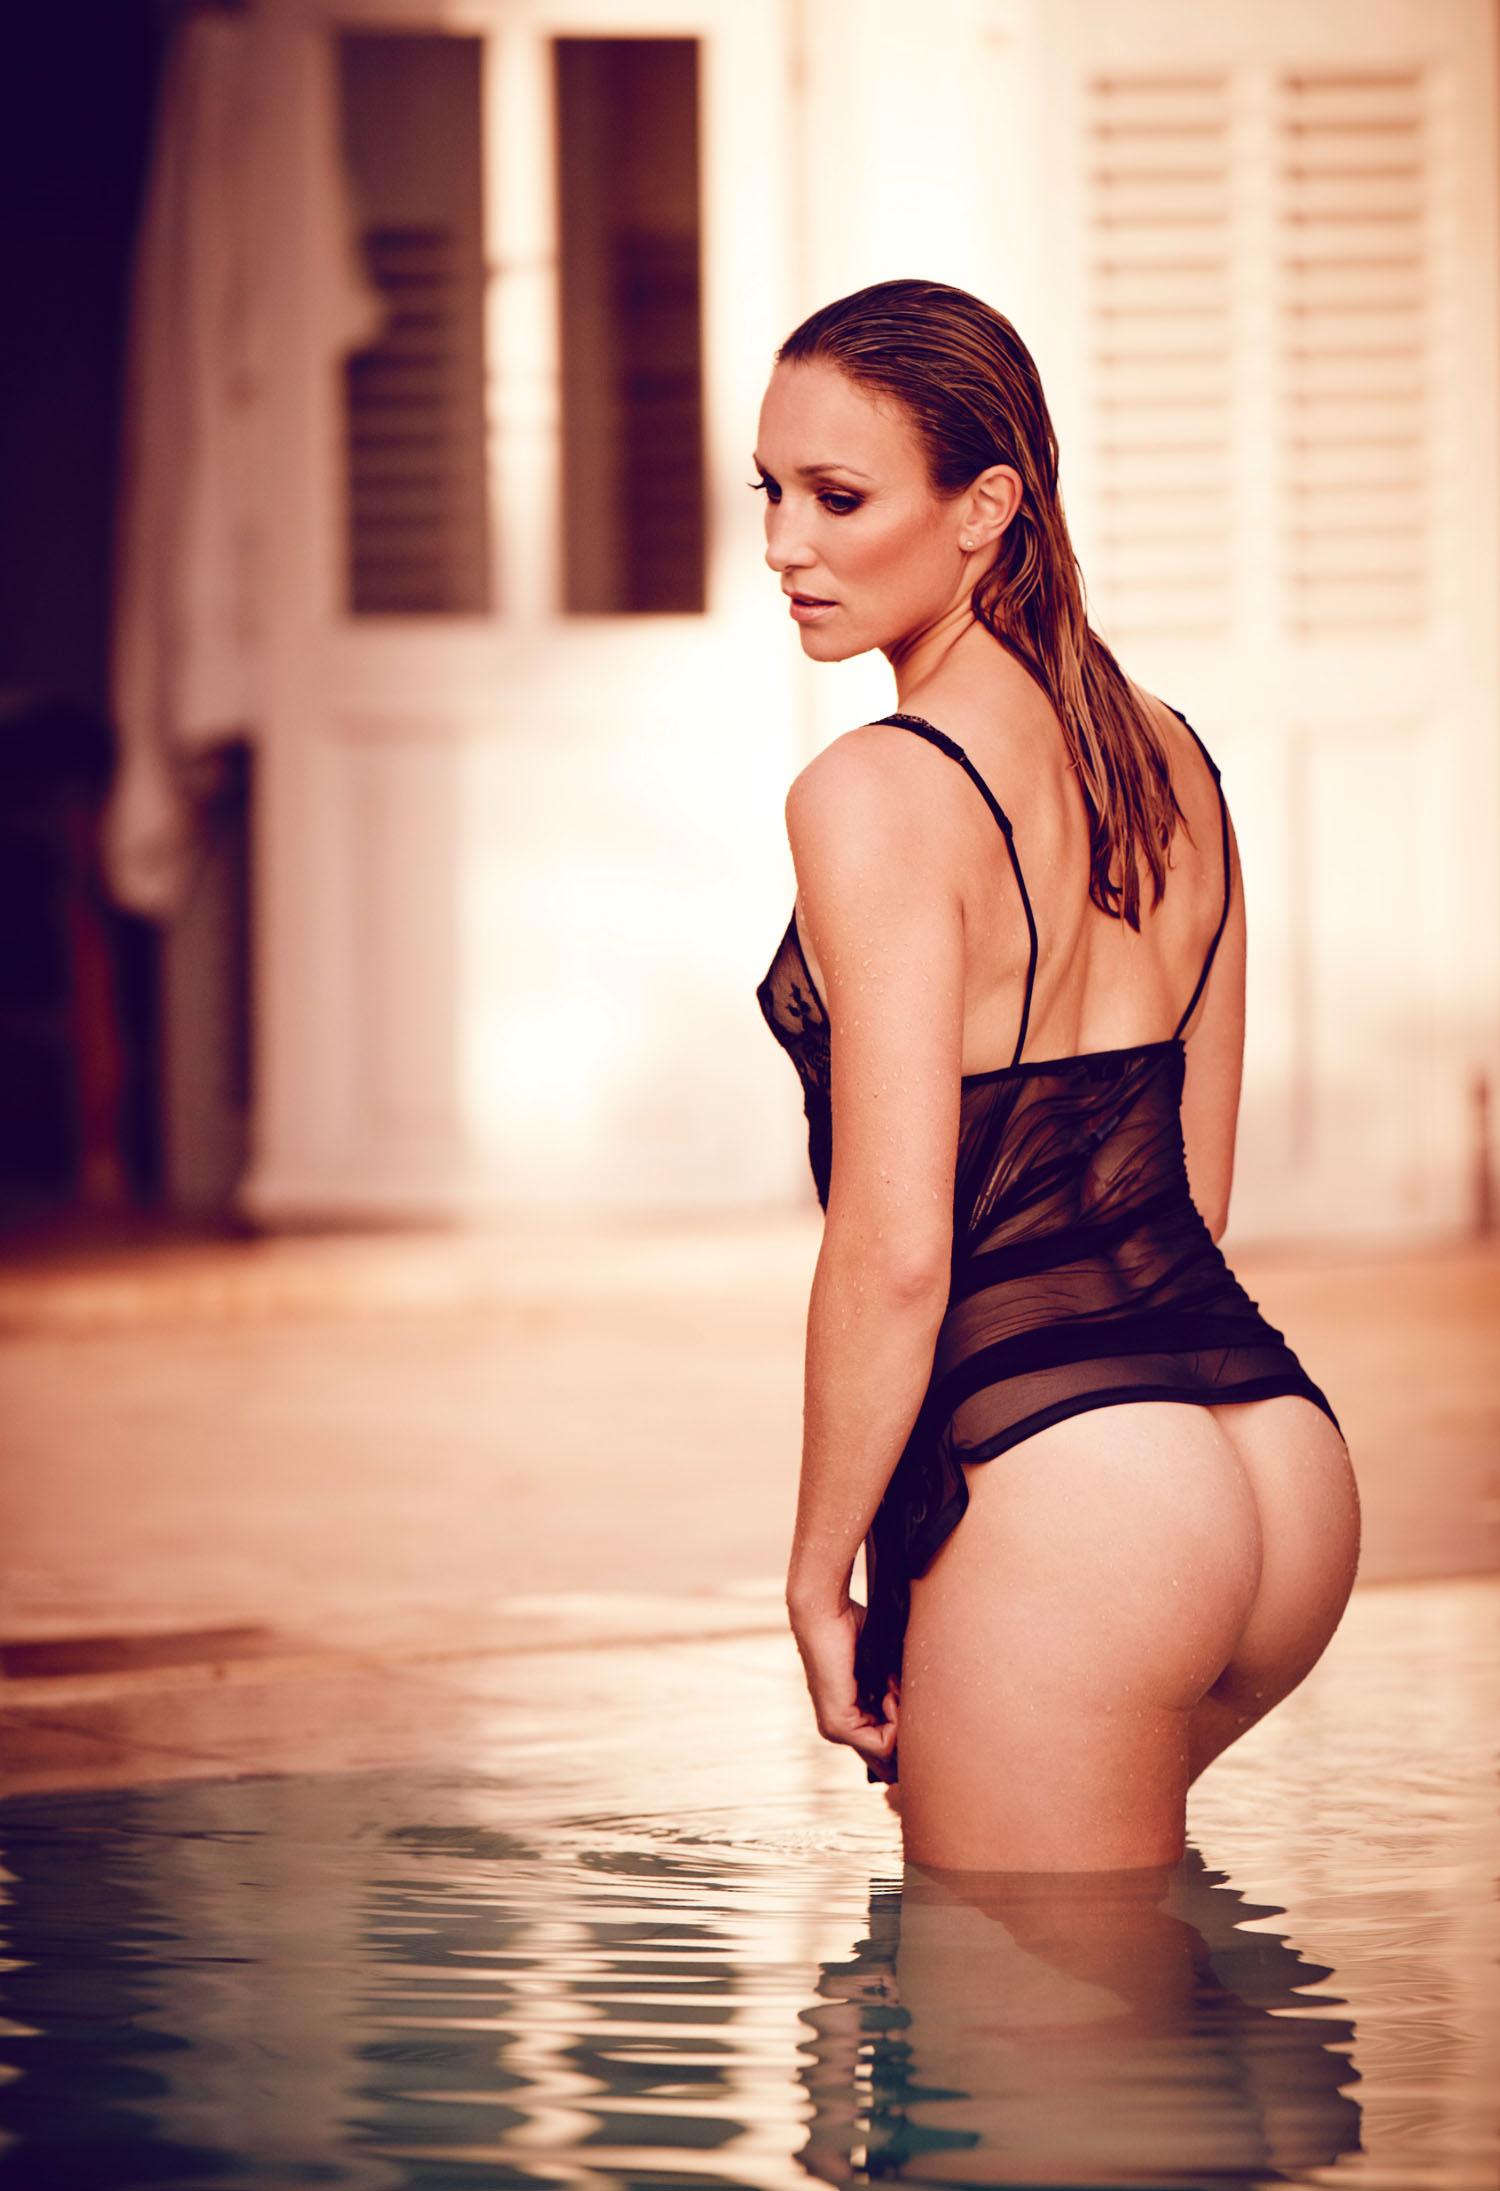 Кристин Тэйсс голая. Фото - 48